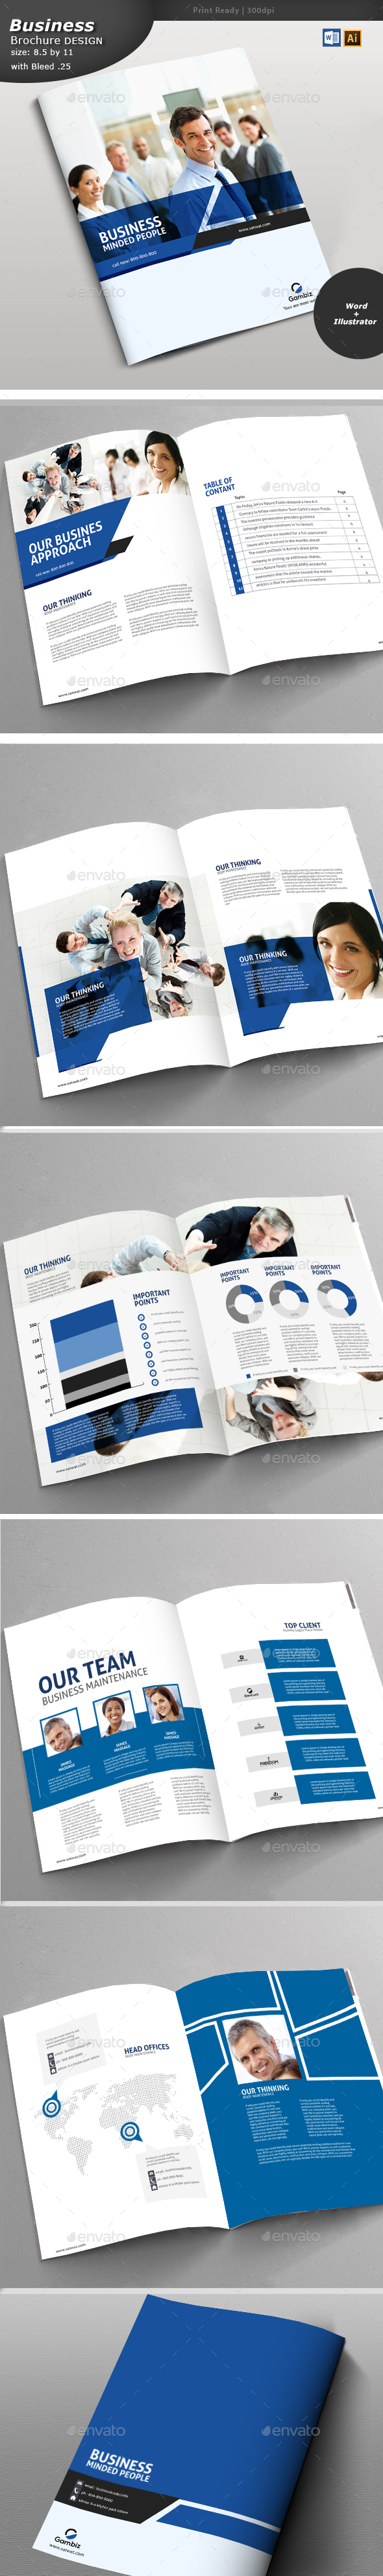 Corporate Brochure Design - Brochures Print Templates